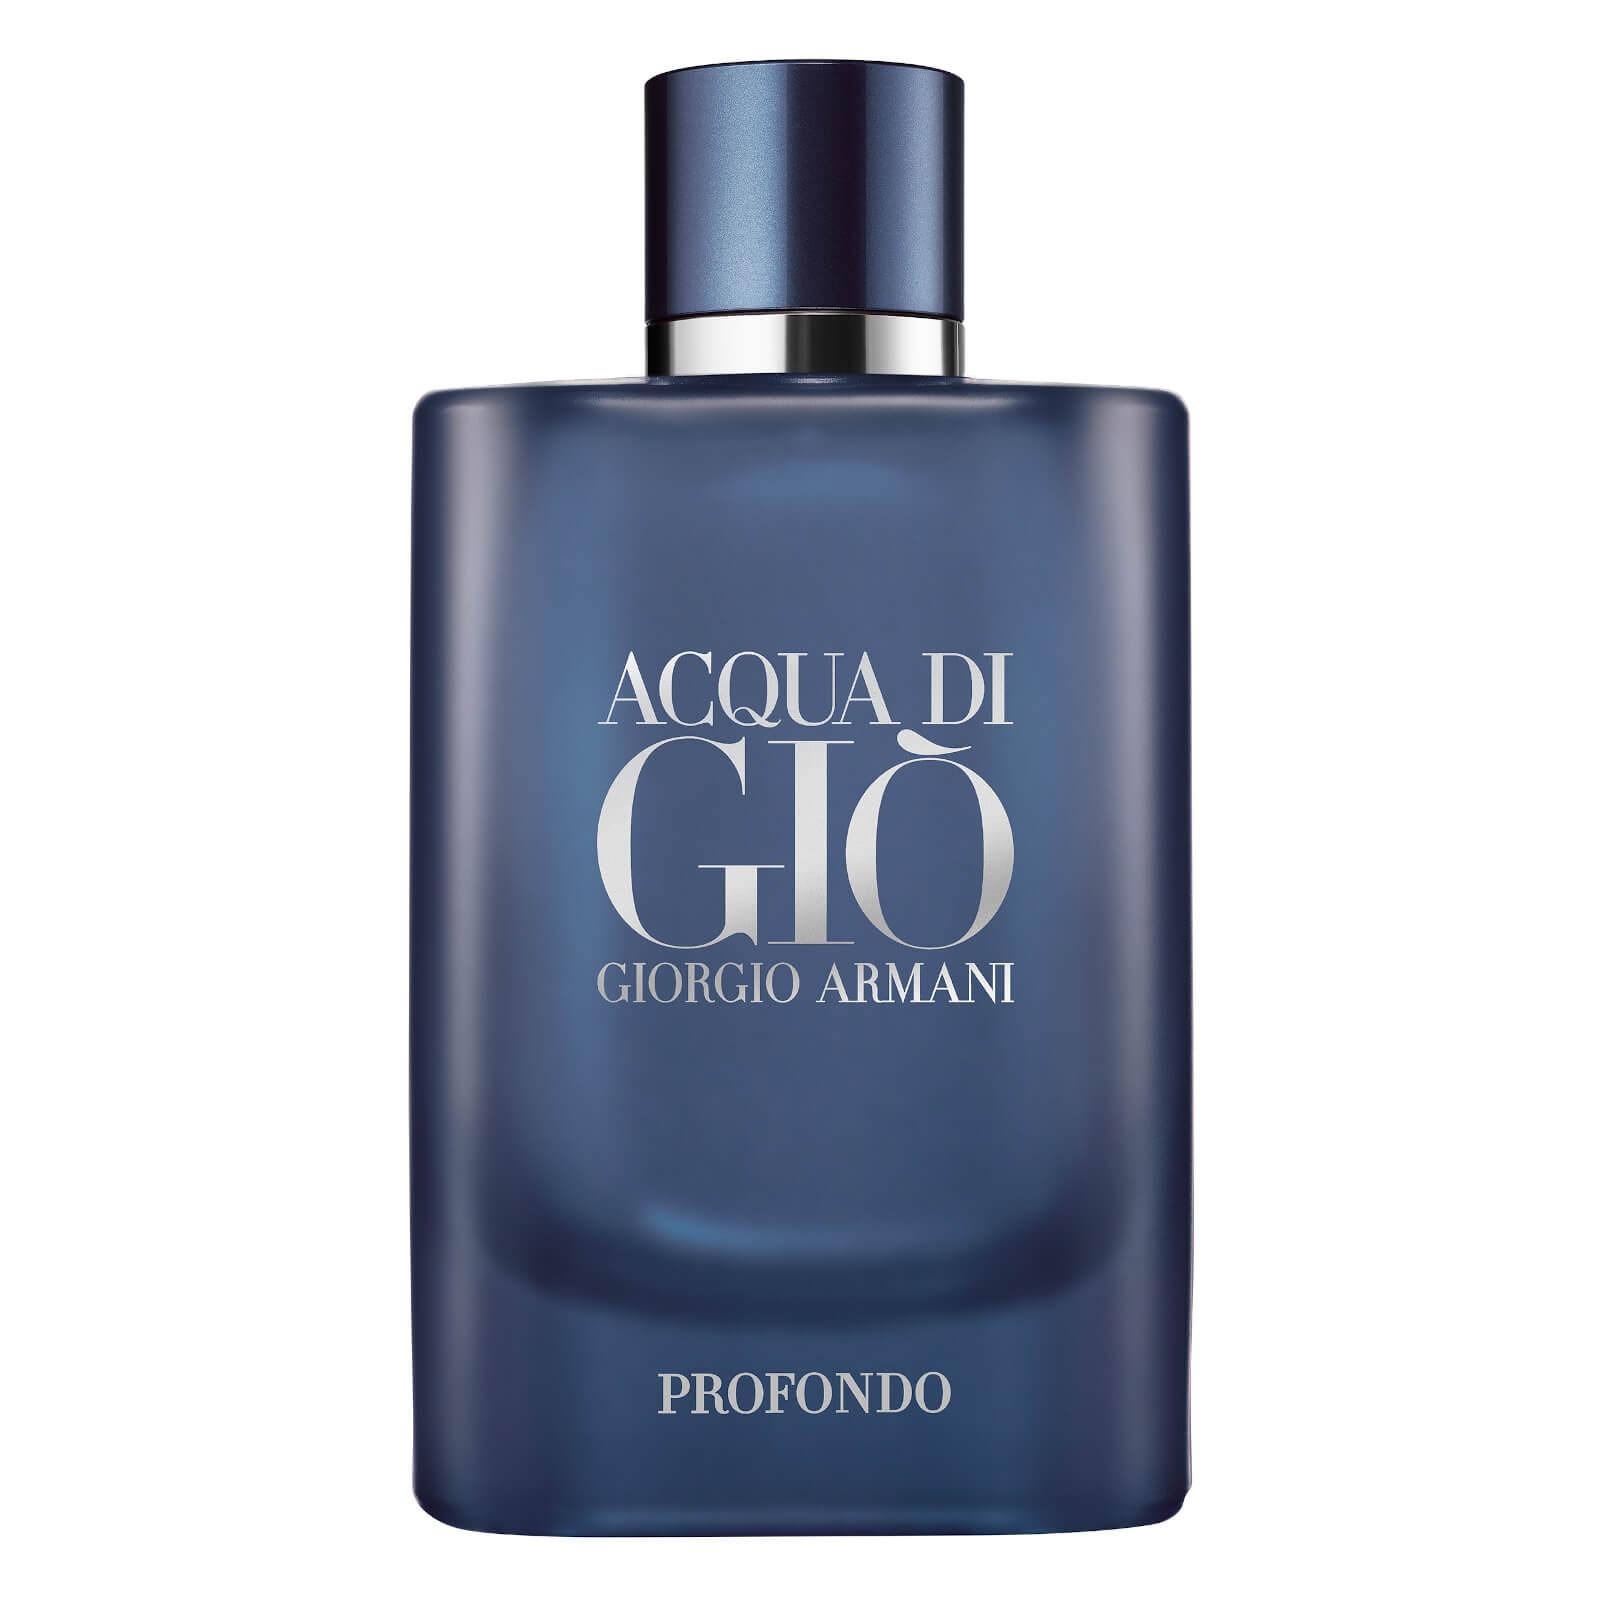 Armani Acqua Di Gio Profondo Eau de Parfum (Various Sizes) - 75ml